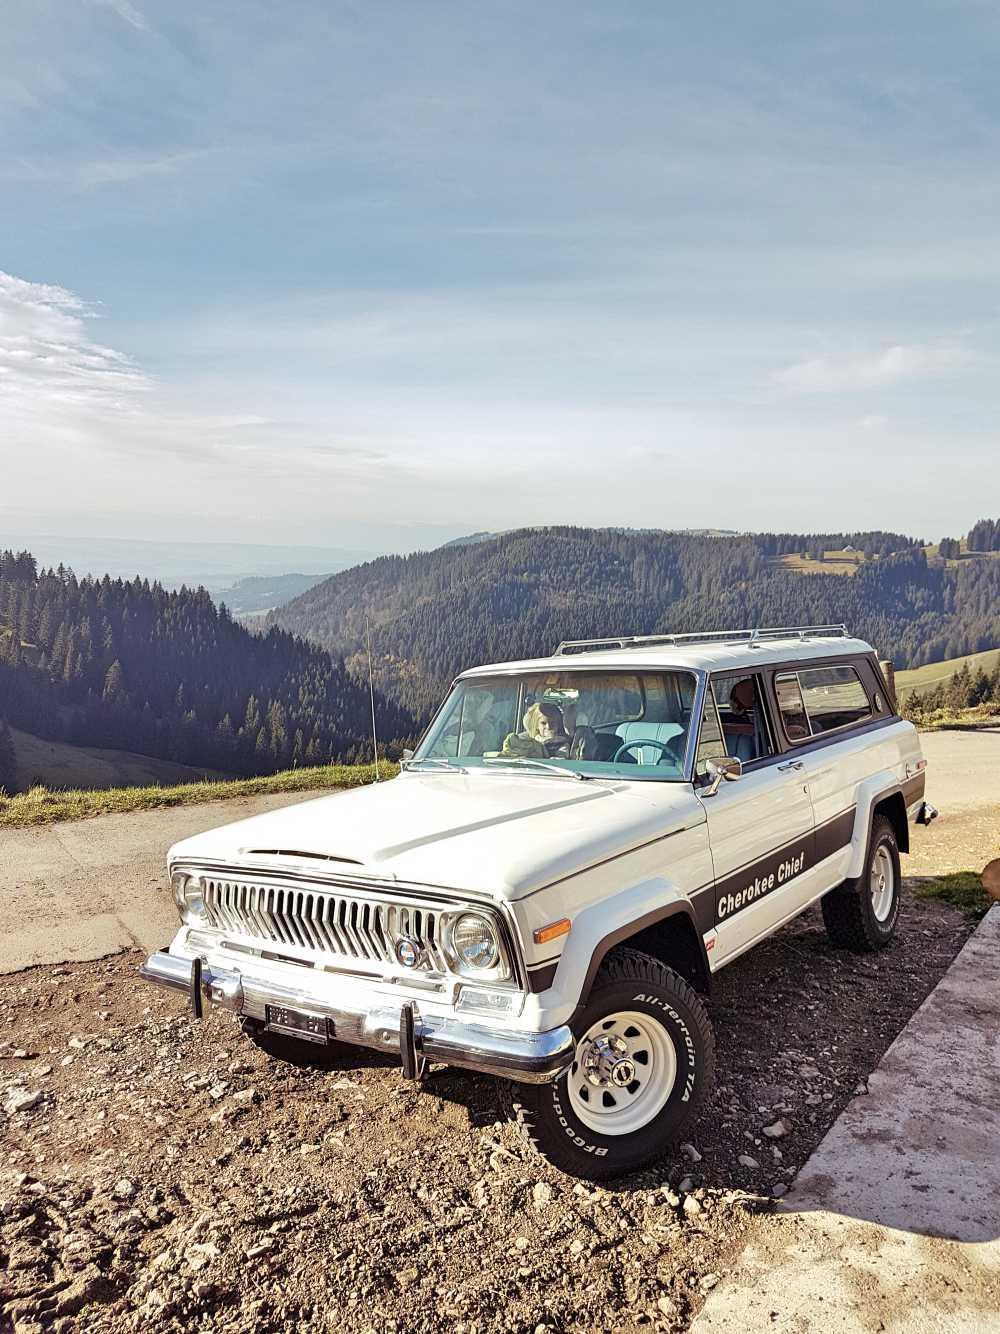 jeep-cherokee-chief-1978-shooting-moleson-50